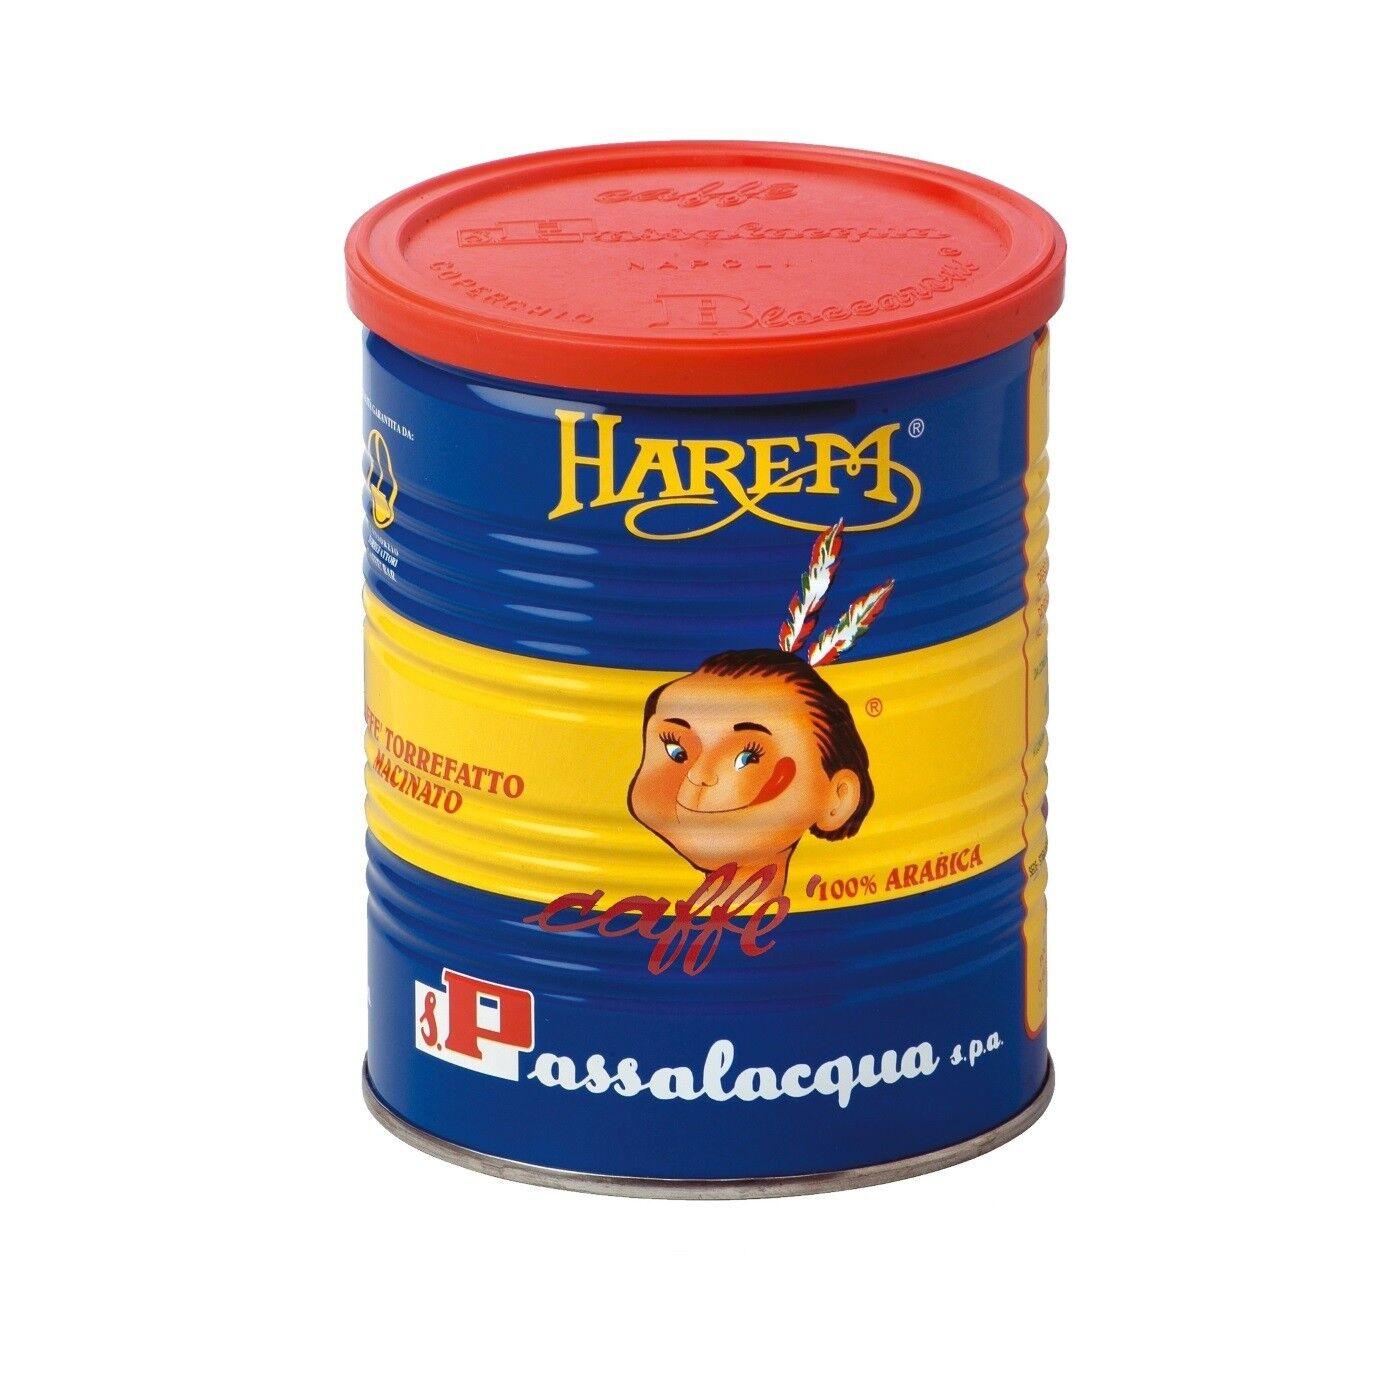 PASSALACQUA Harem 12x 250 g gemahlen in Dosen